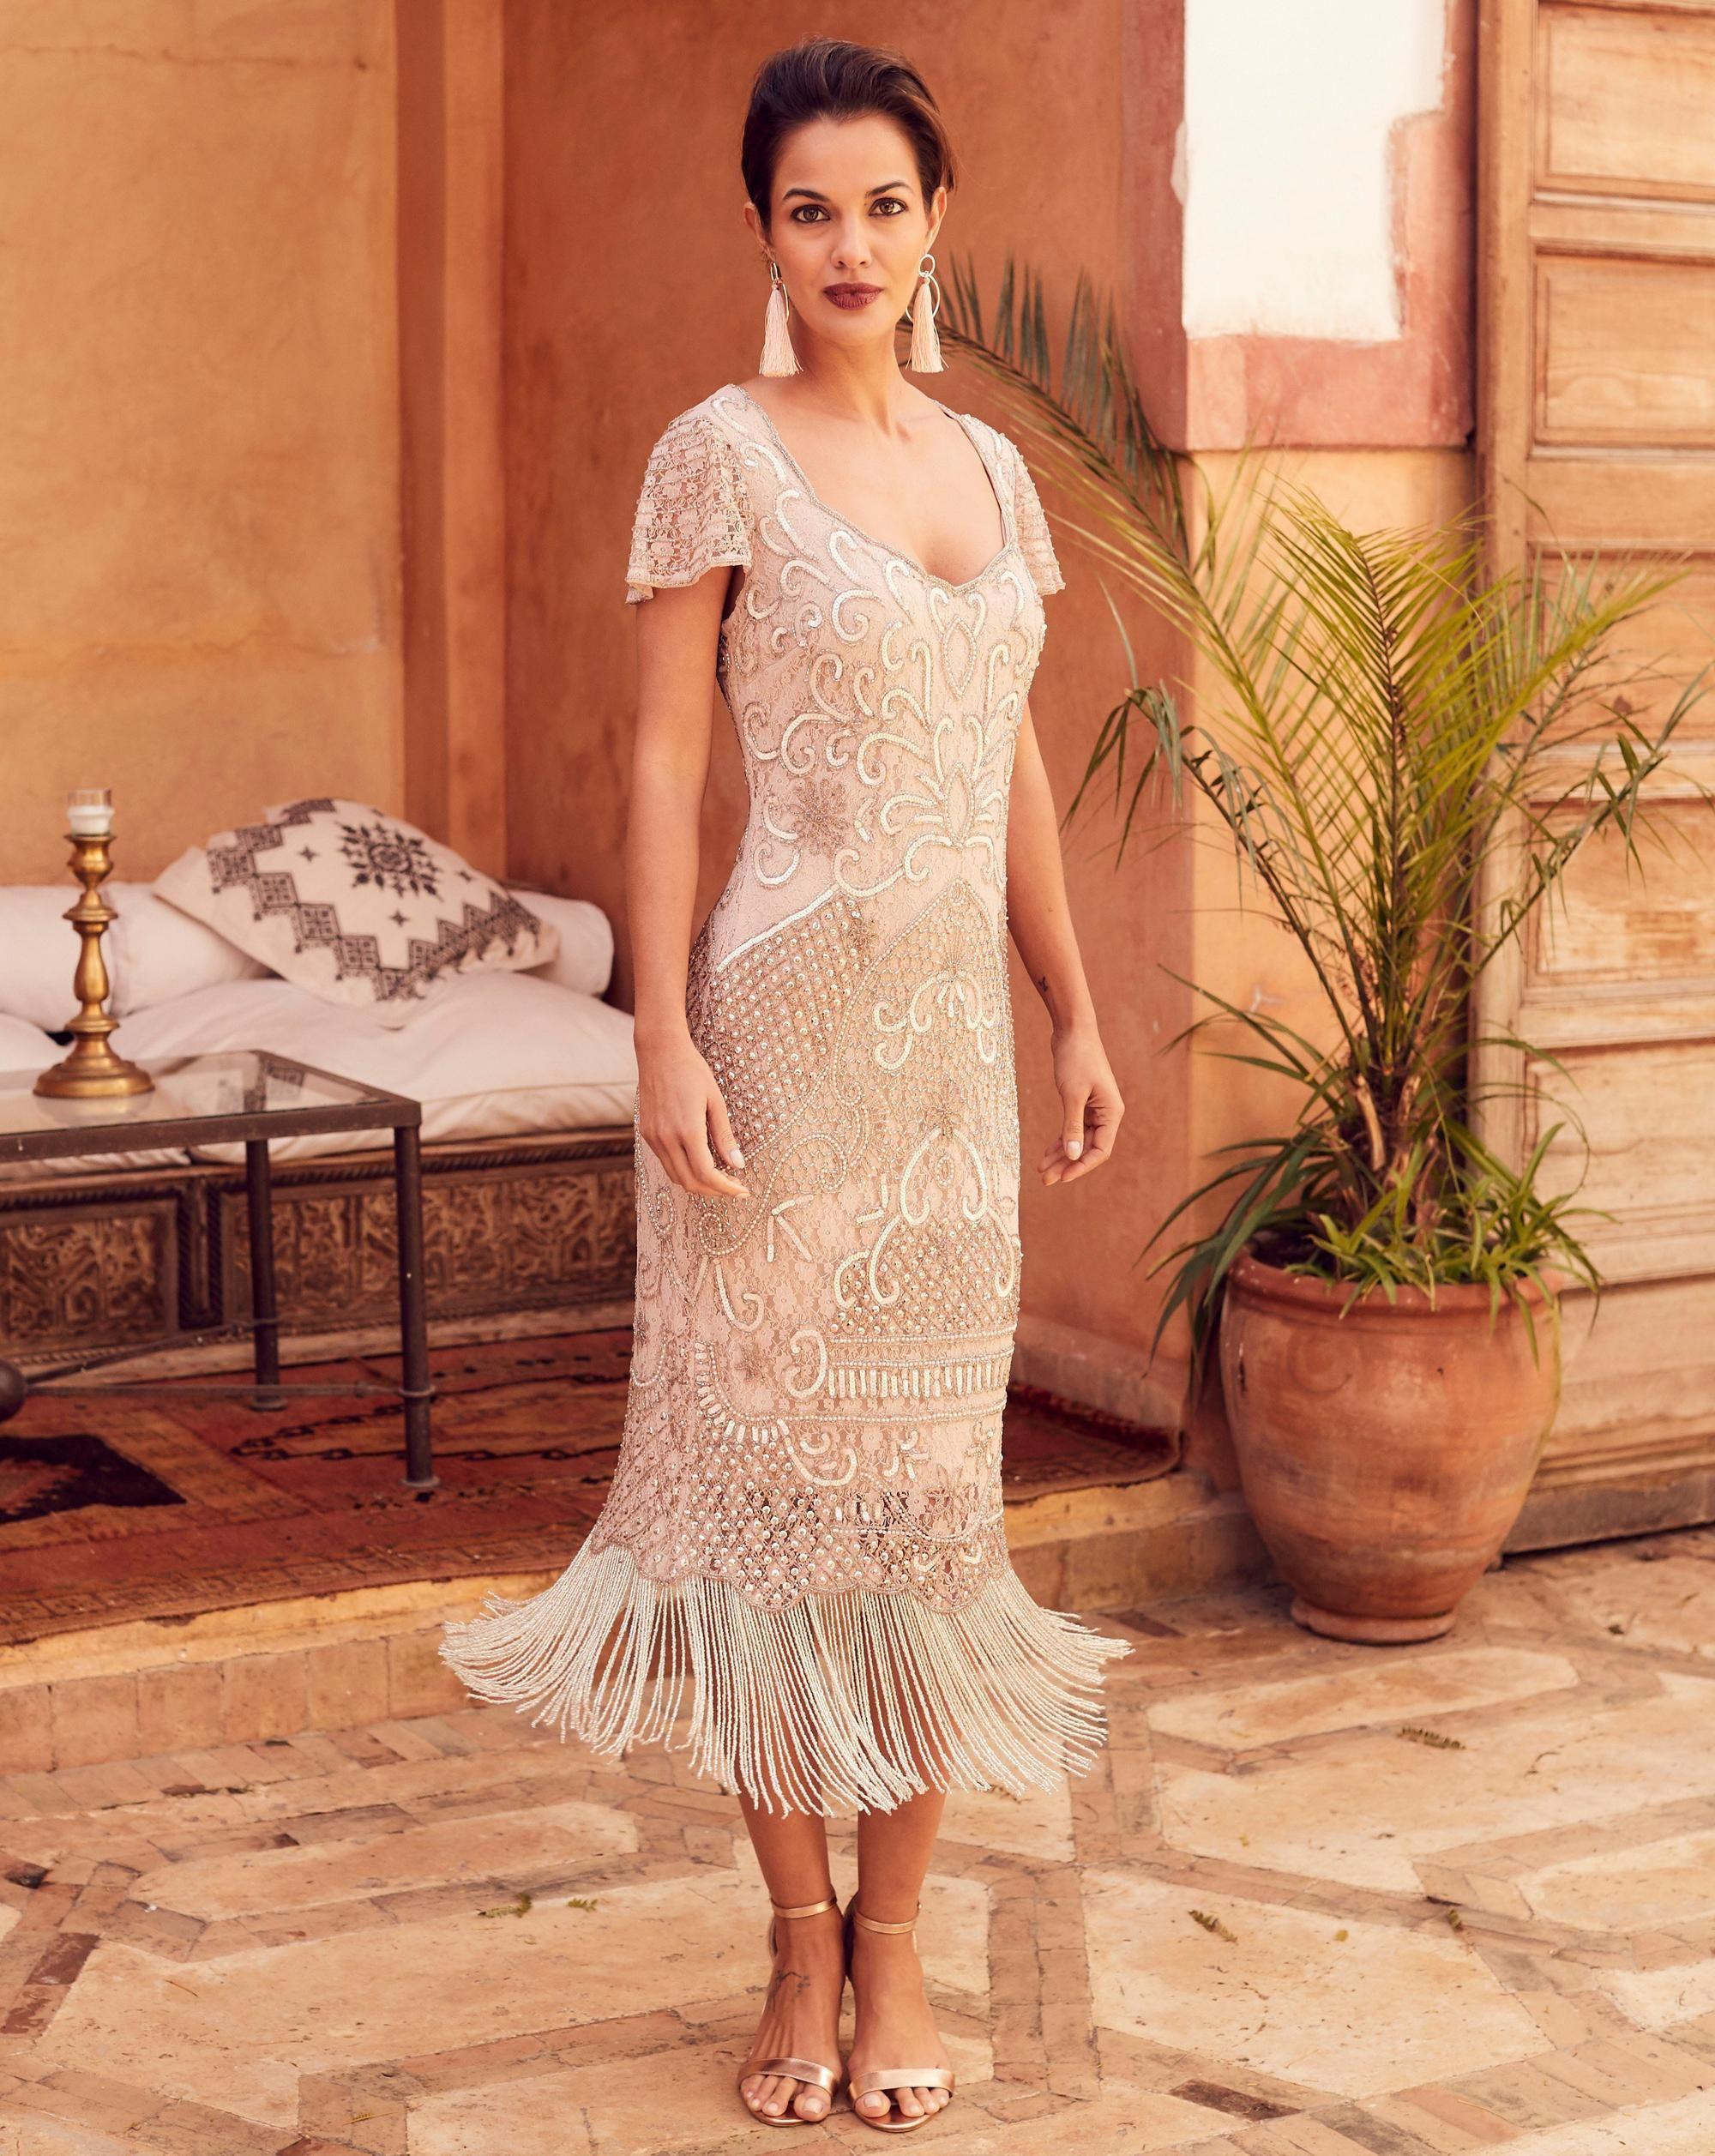 1920s Evening Dresses Formal Gowns Beaded Fringe Dress Fringe Flapper Dress Dresses [ 2514 x 2000 Pixel ]